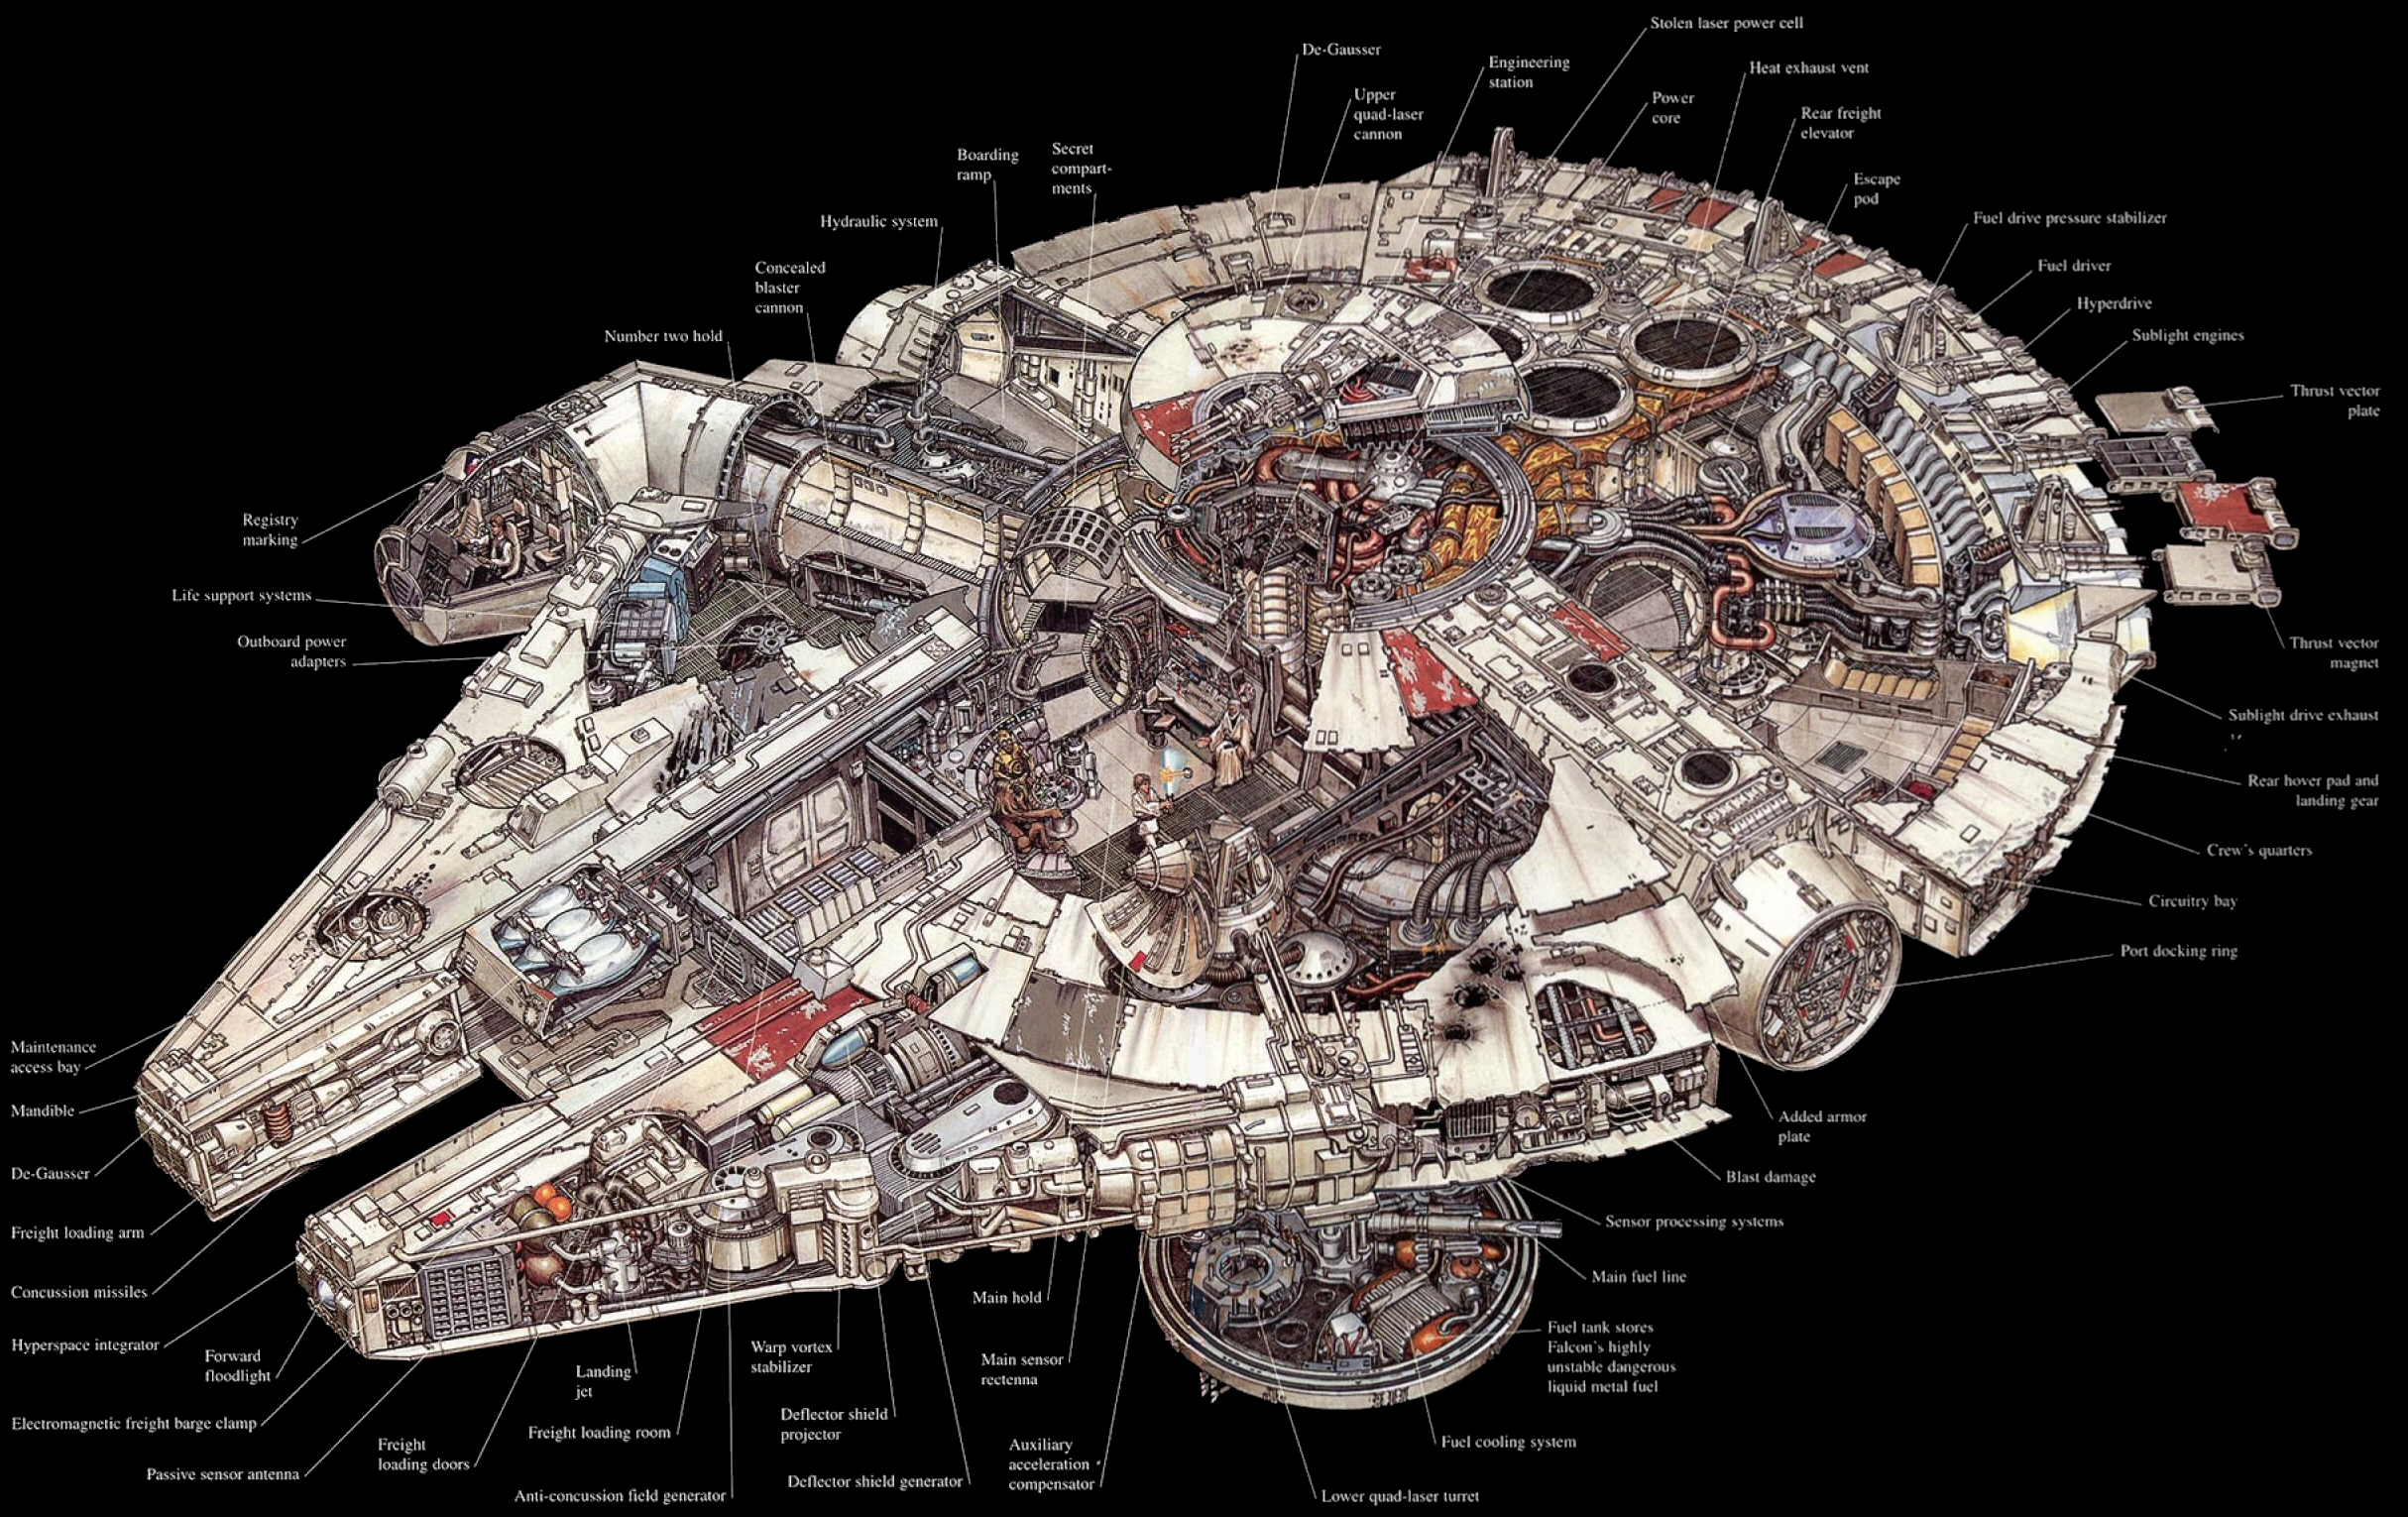 Millenium falcon interior image space ship addicts mod db for Interior halcon milenario